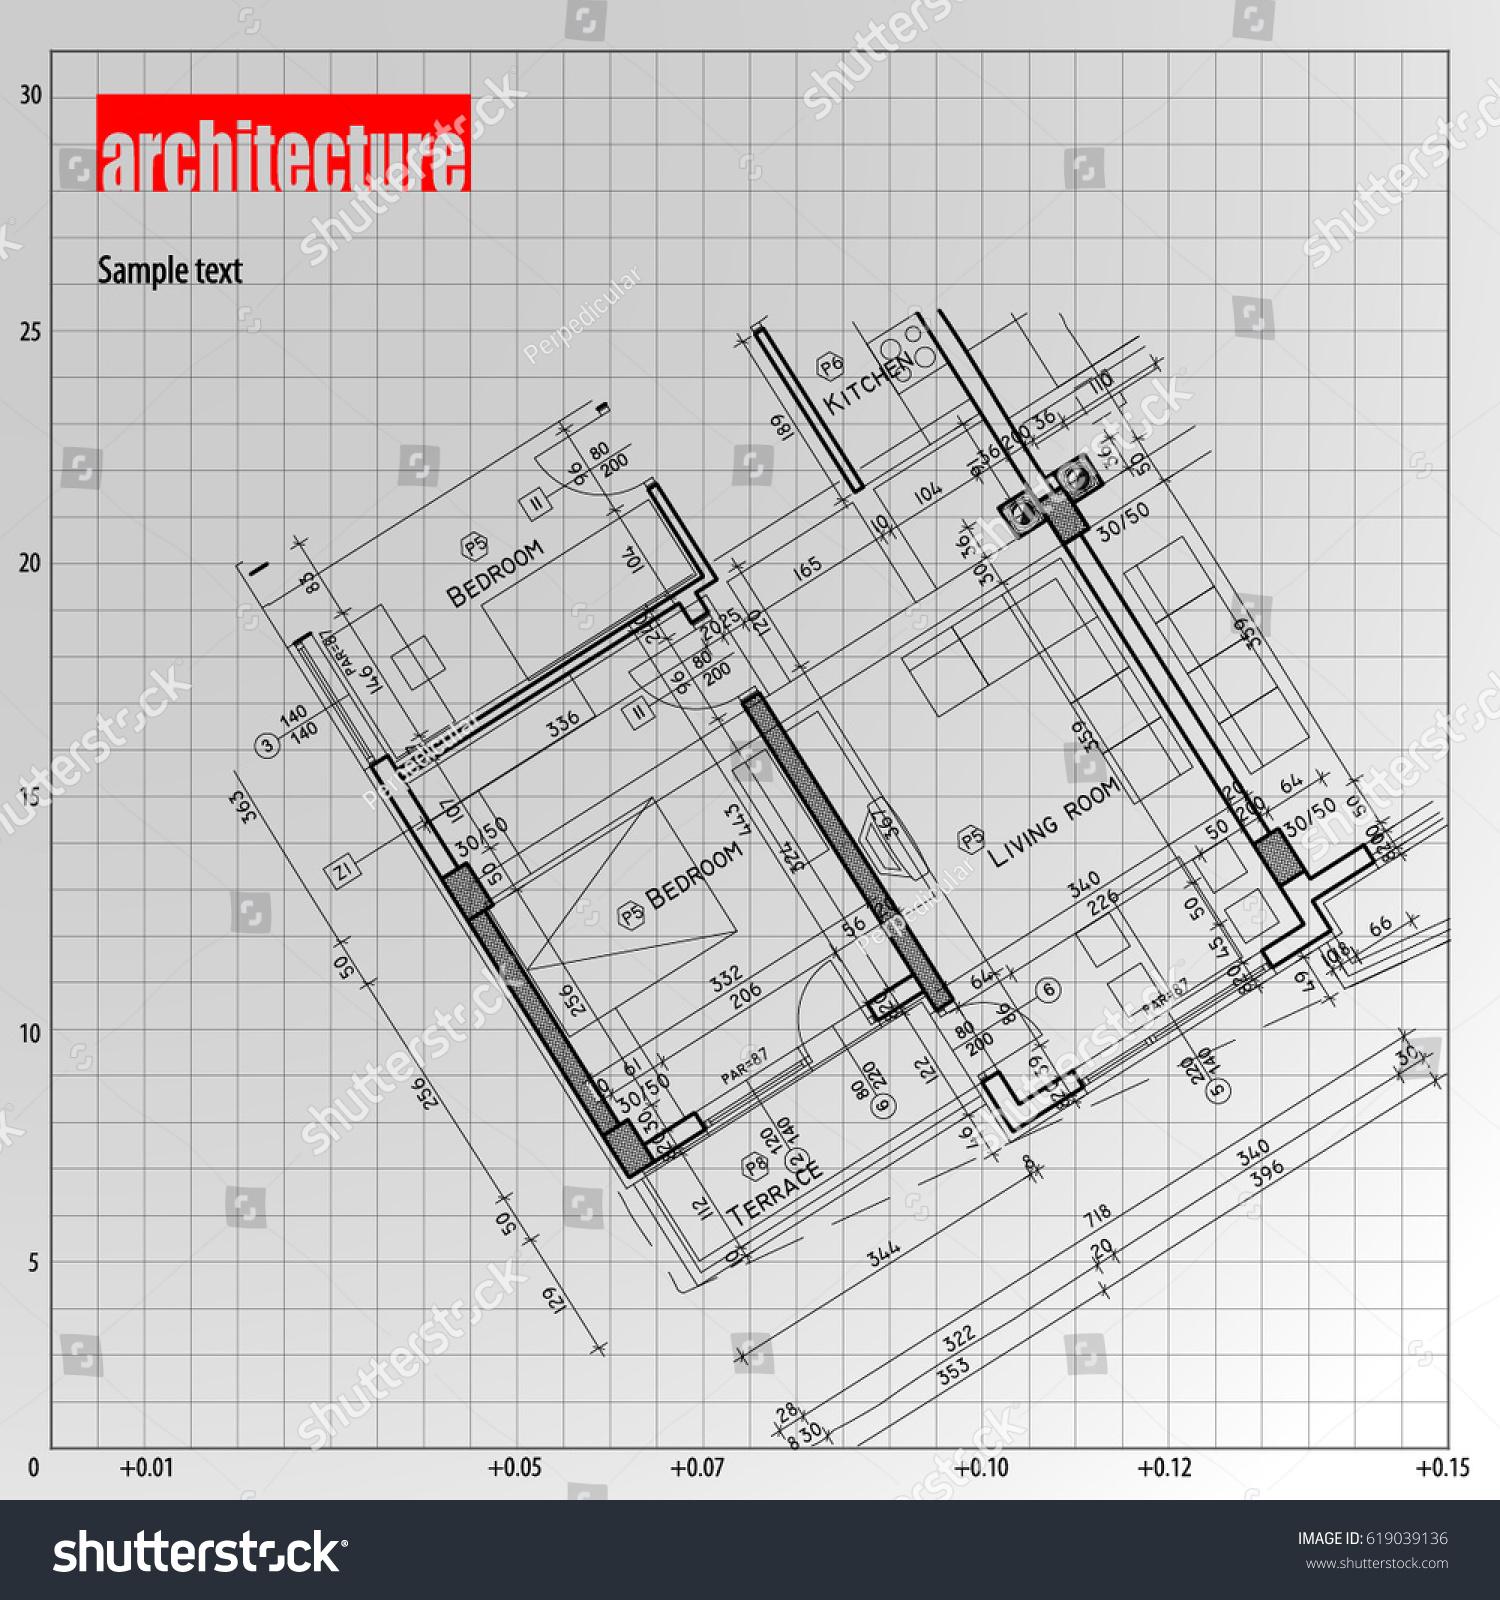 Architecture grid blueprint background sample vectores en stock architecture grid blueprint background sample malvernweather Images